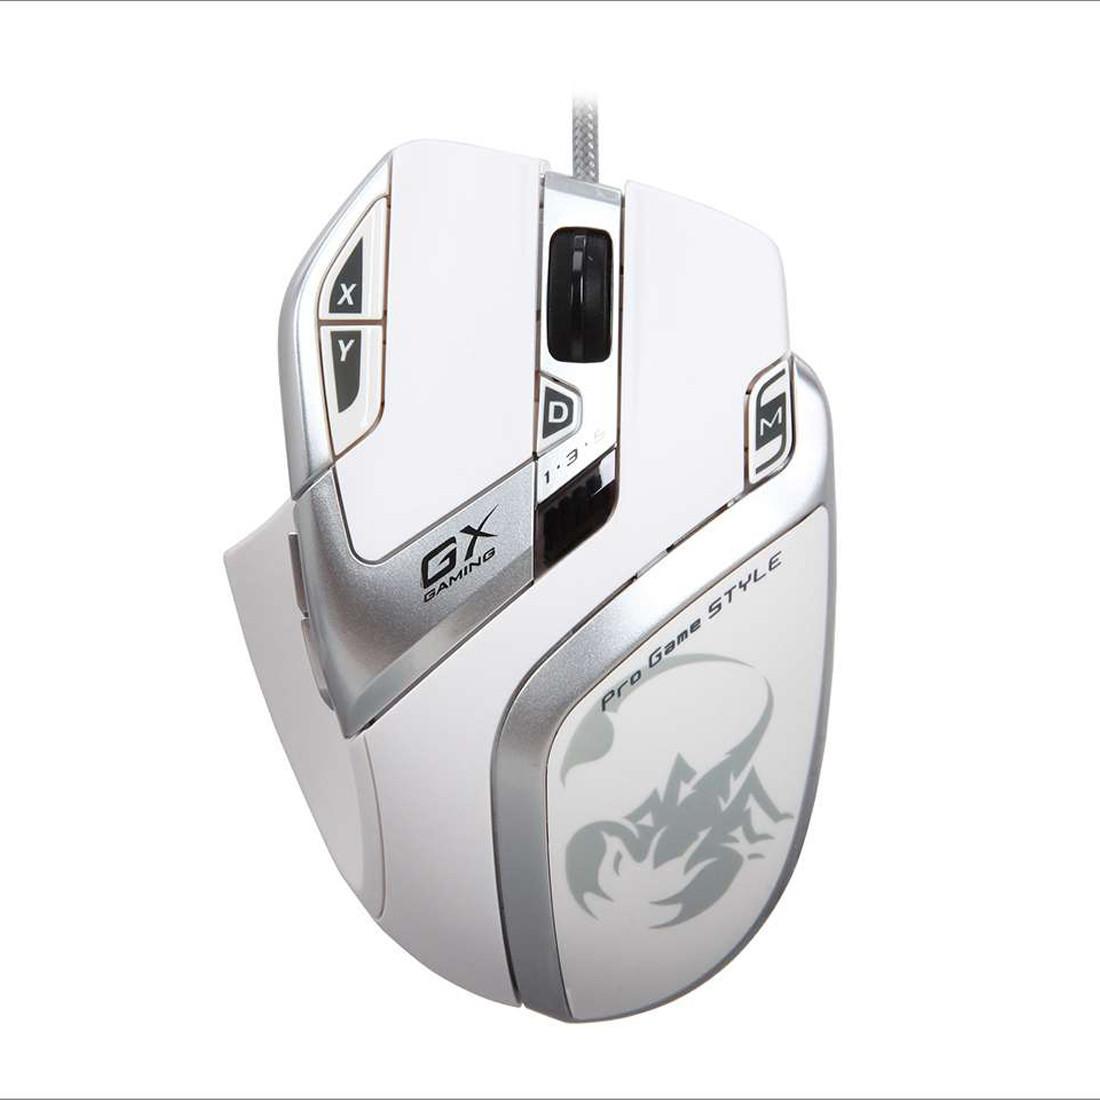 Оптическая мышка Genius DeathTaker White Edition